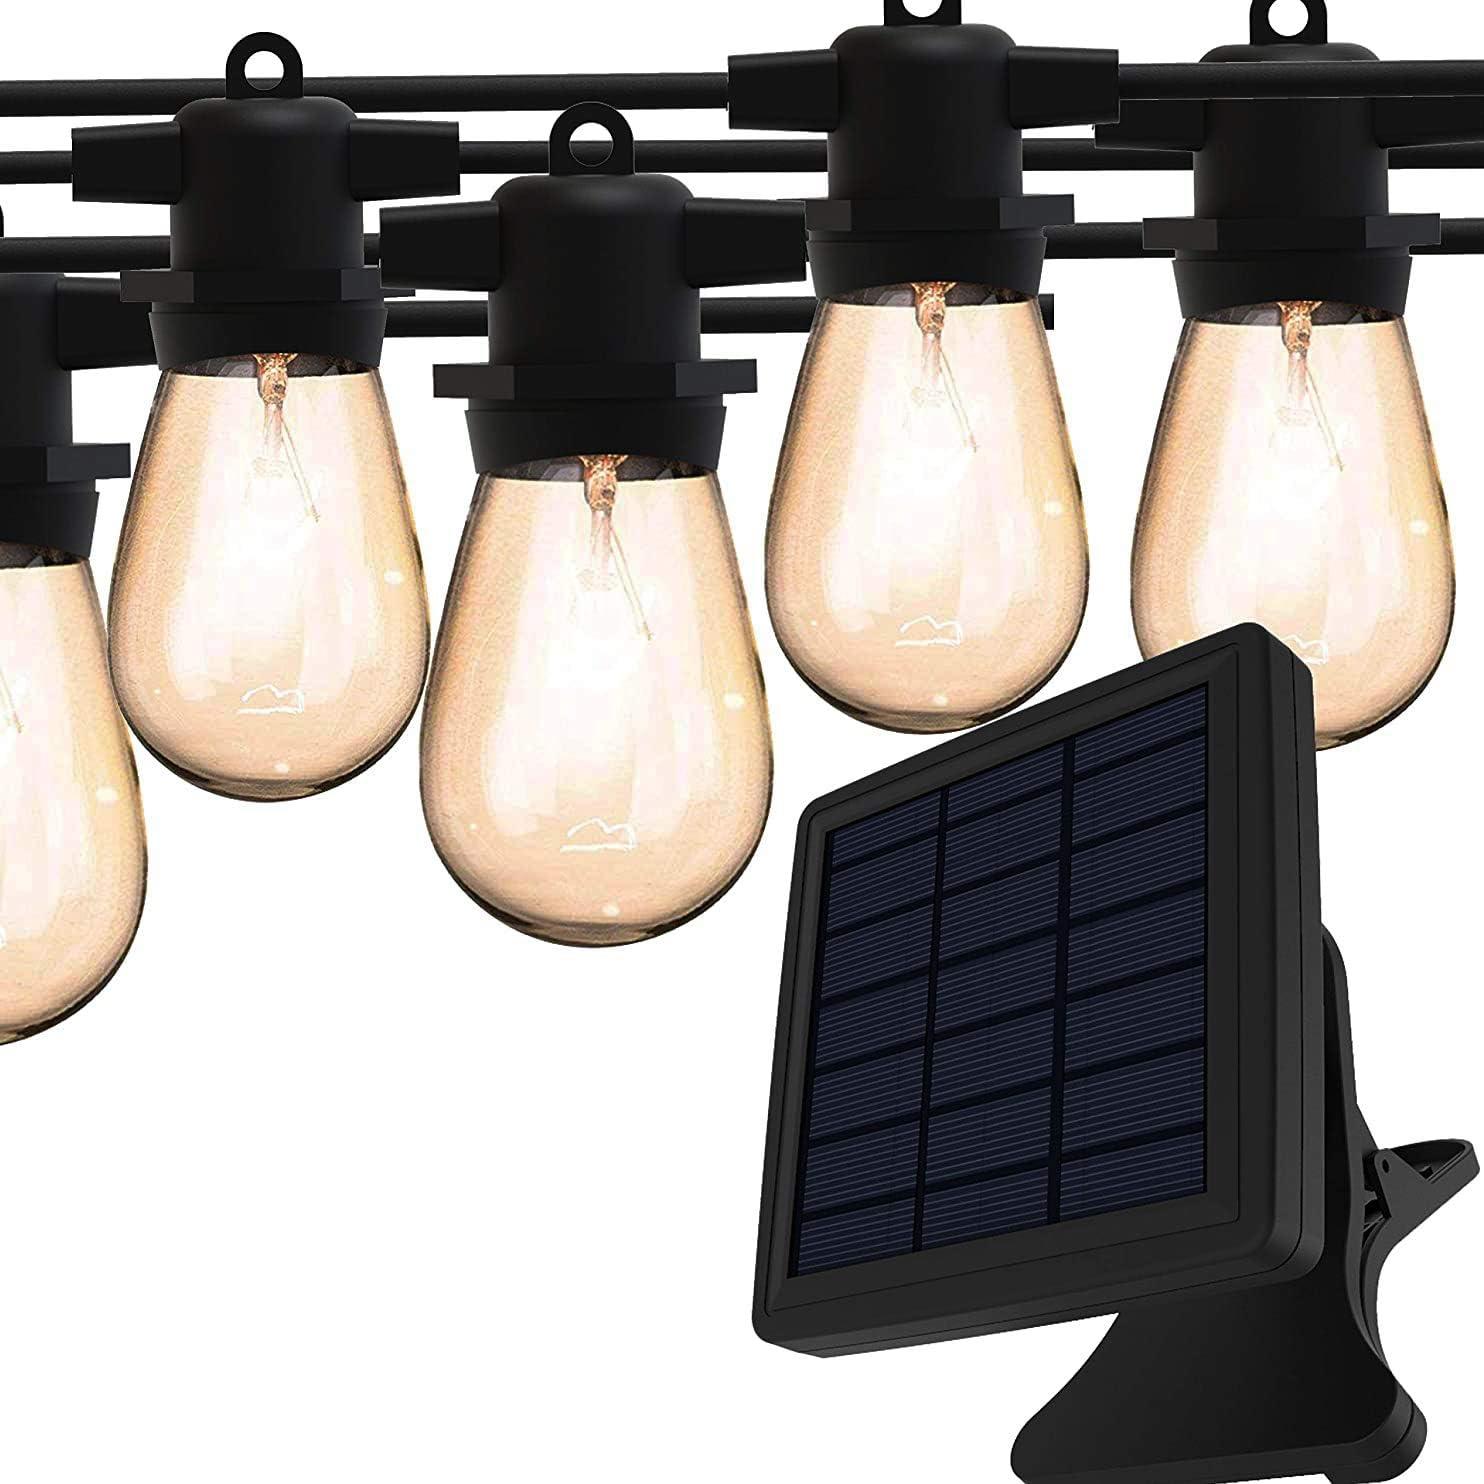 Waterproof LED Solar Light Bulb Outdoor Camping Garden Practical Night Light